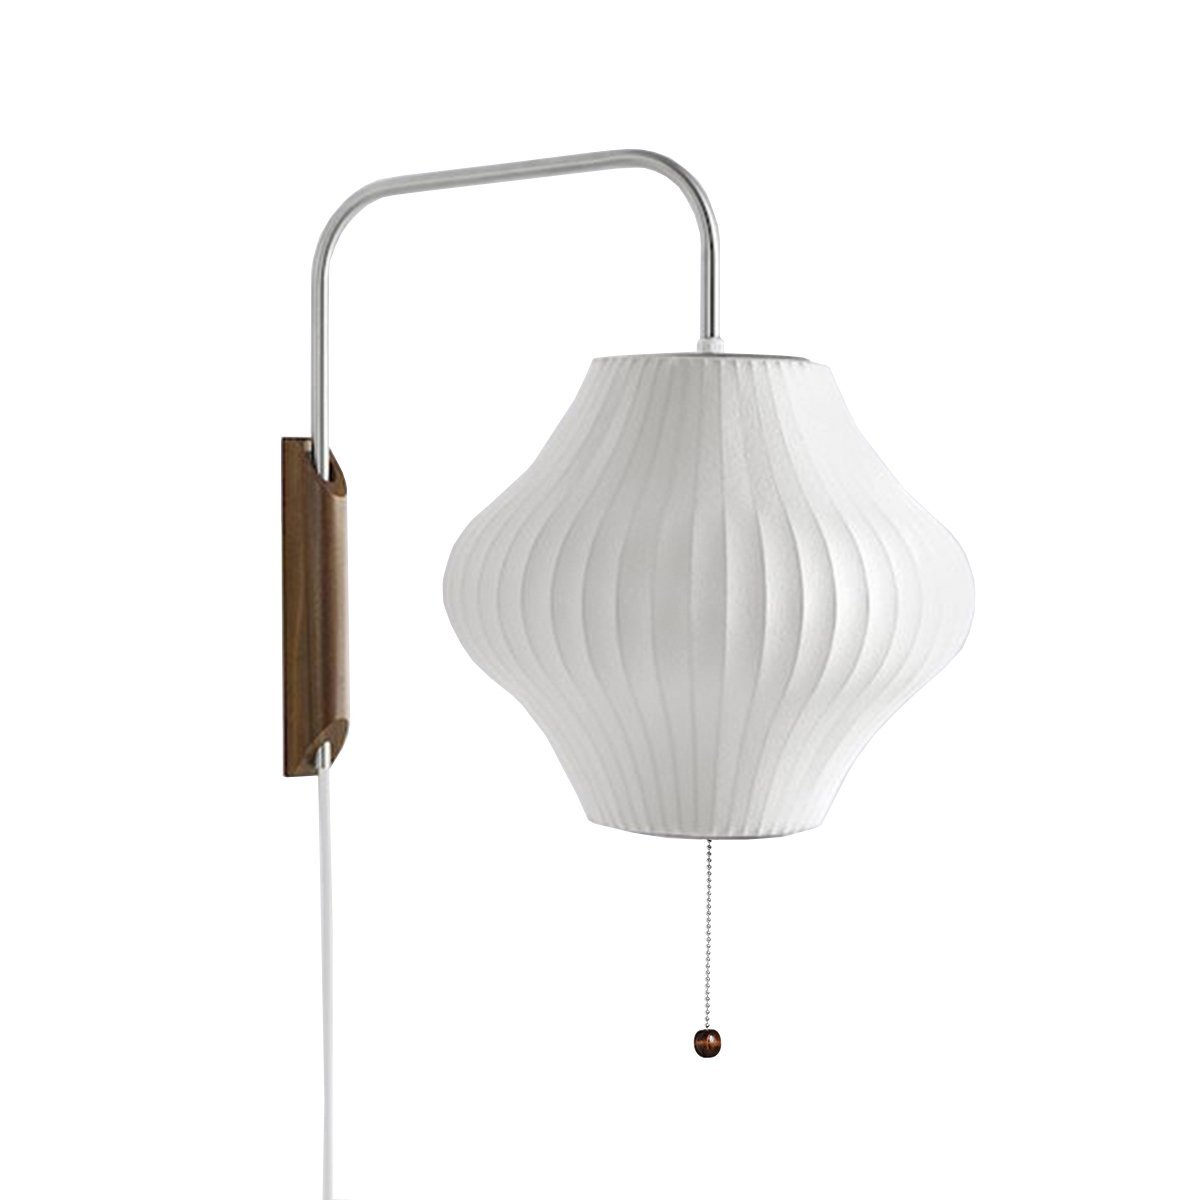 HAY Nelson Pear Wandlamp - Small